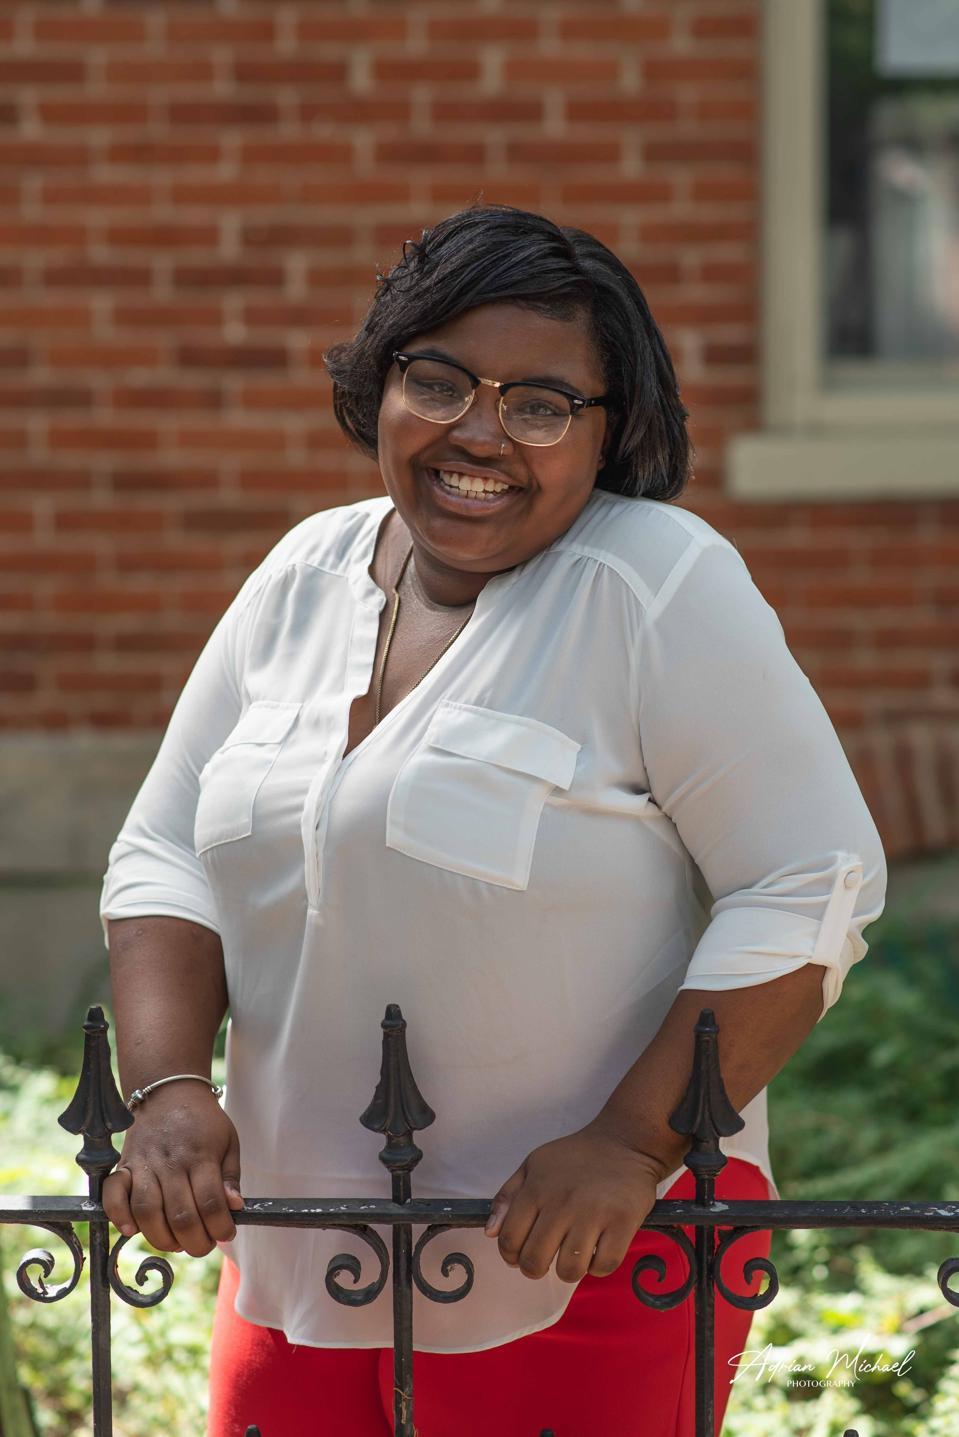 Future educator Aariyah Johnson in downtown Denver